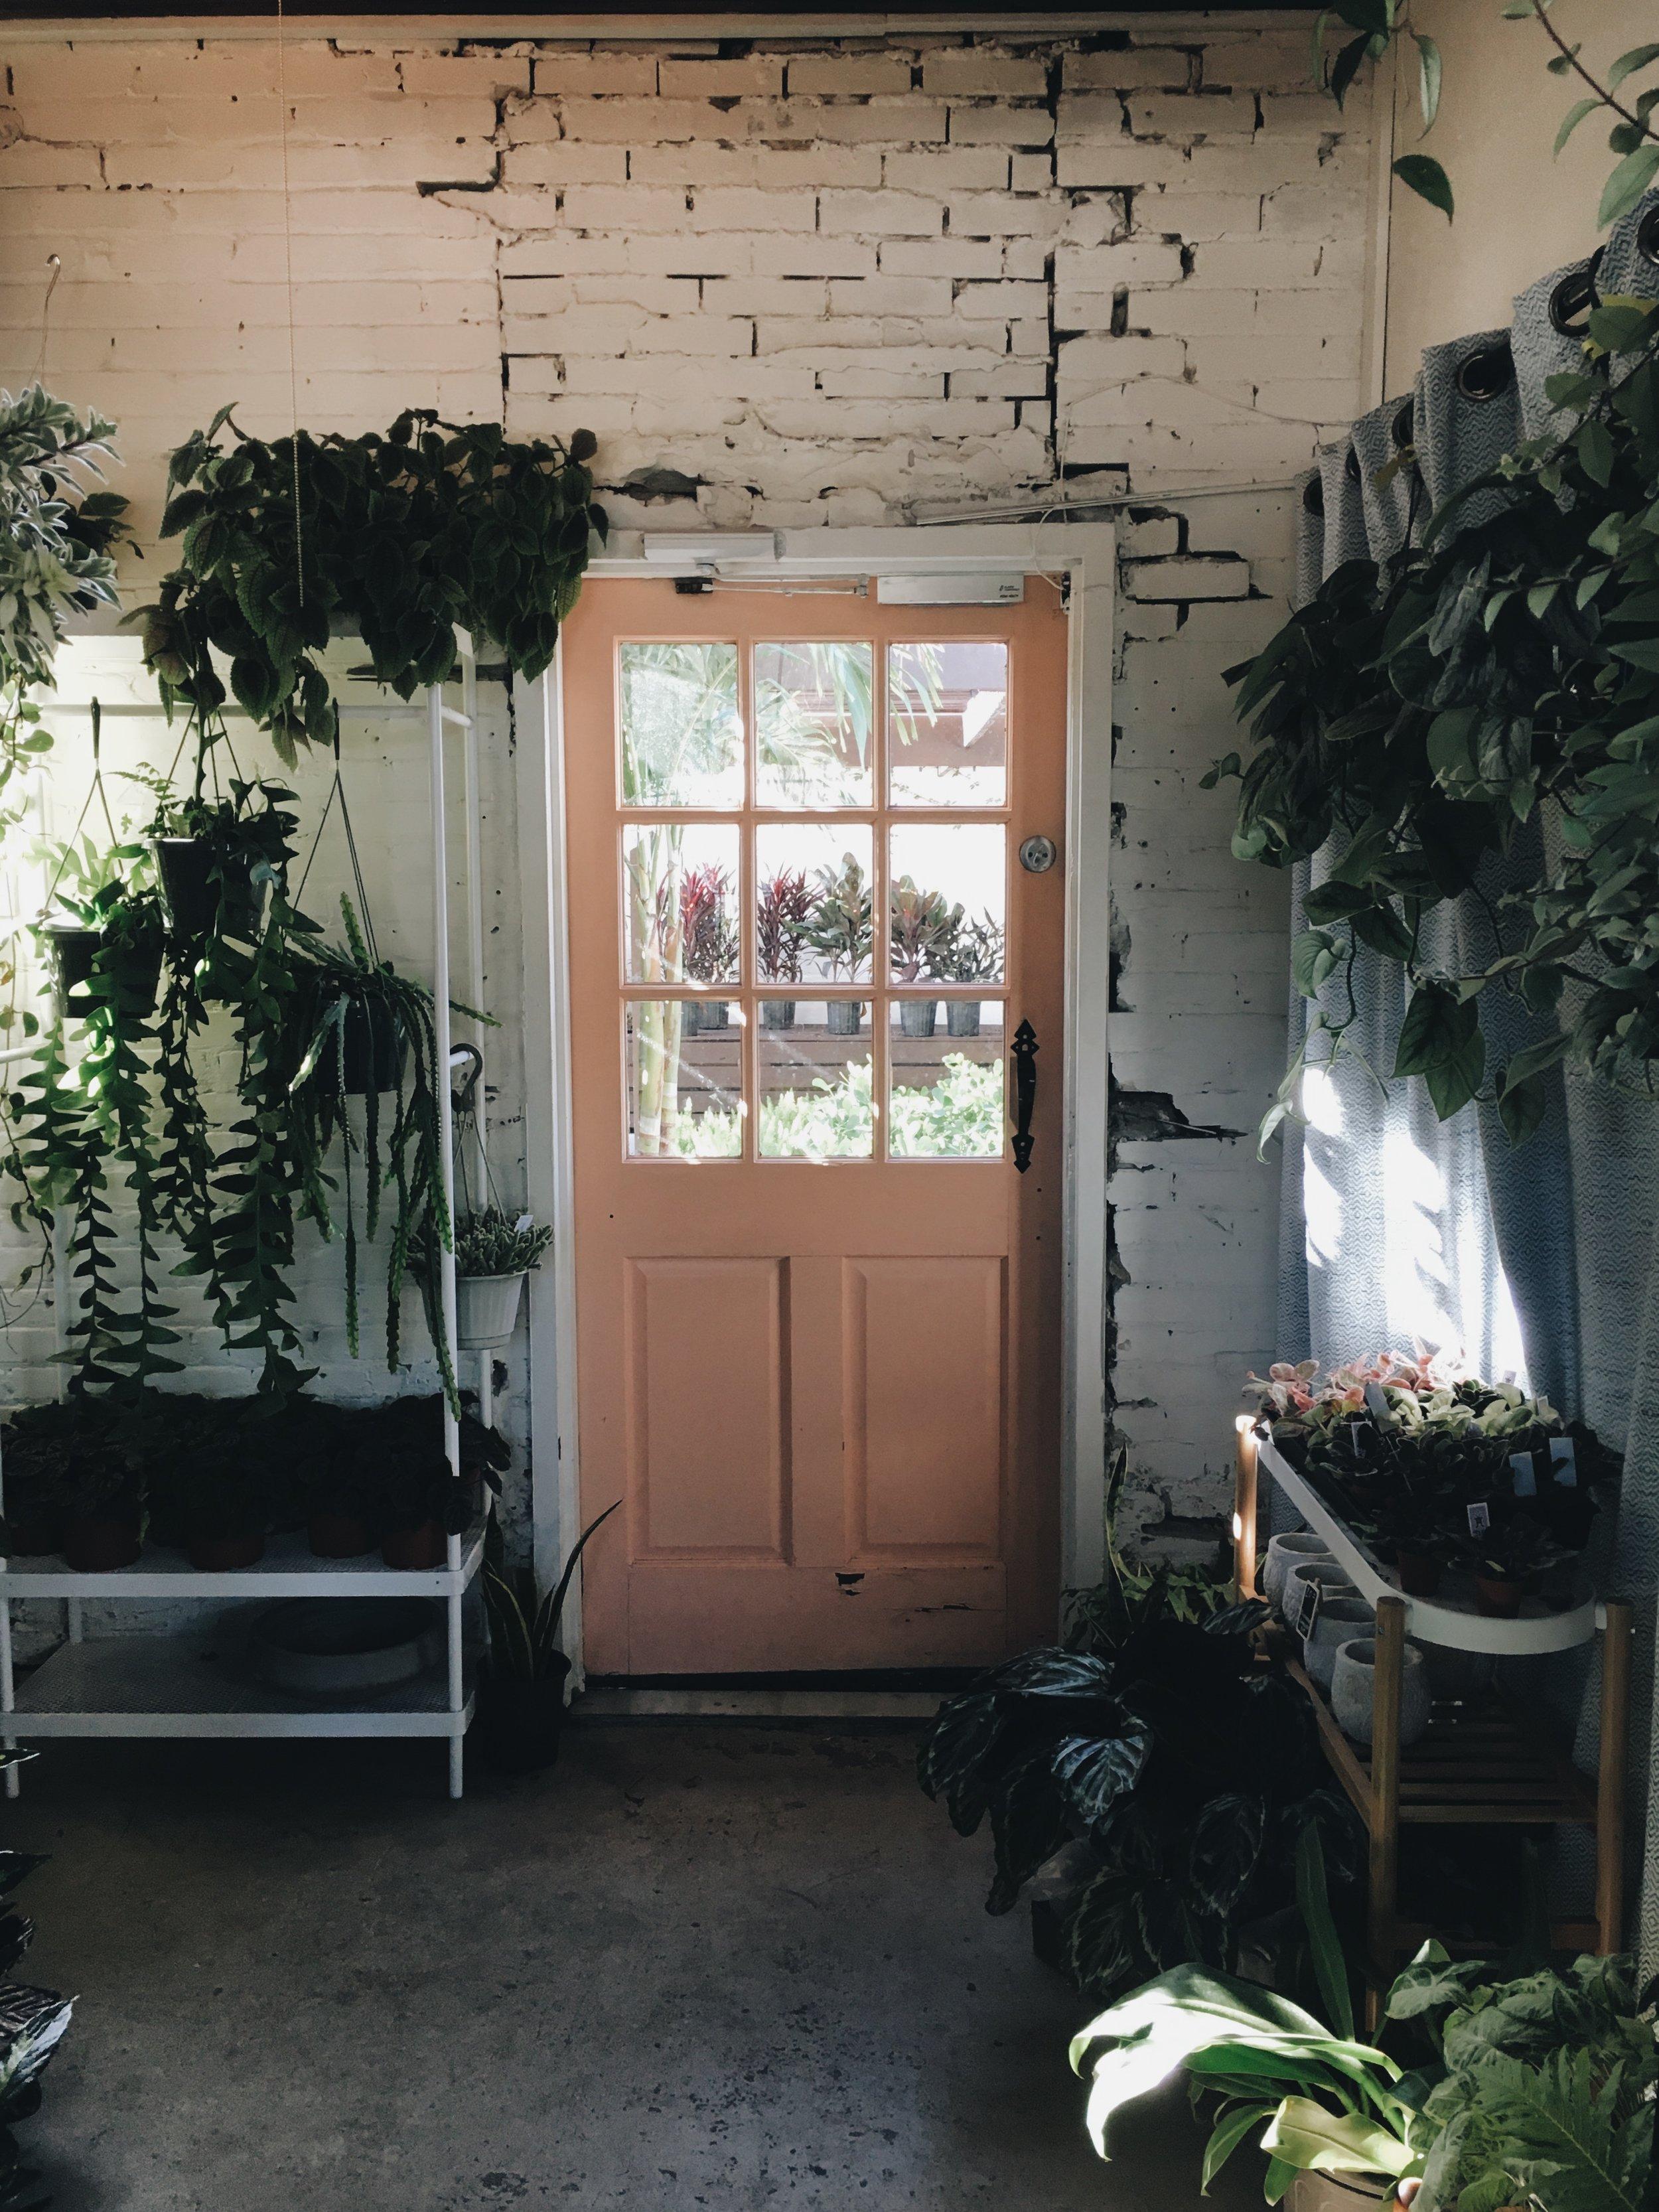 Fancy Free Nursery |1502 N Florida Ave, Tampa, FL 33602